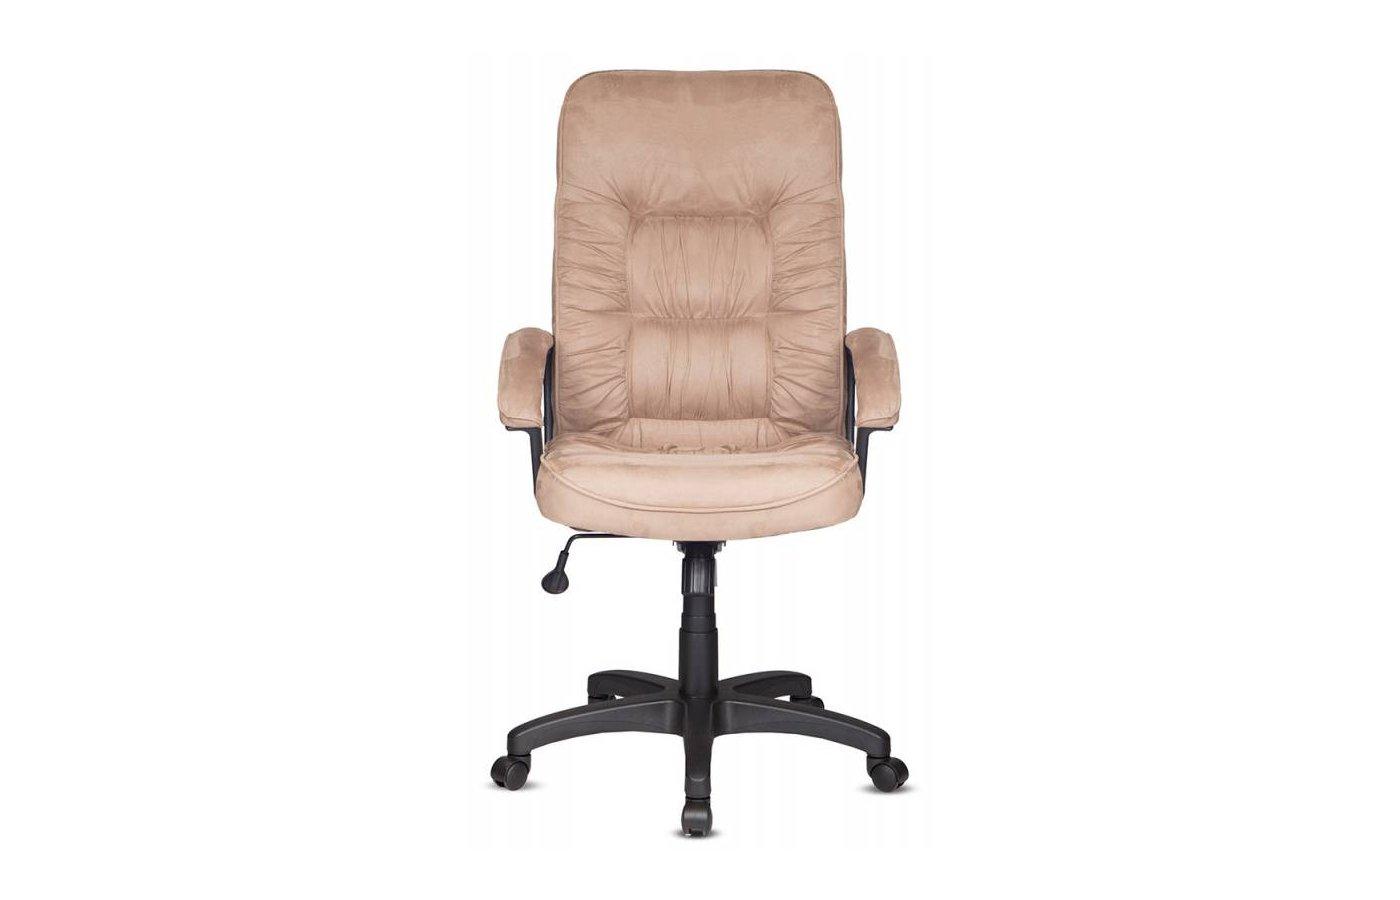 Кресло руководителя Бюрократ T-9908AXSN/MF103 бежевый MF103 микрофибра